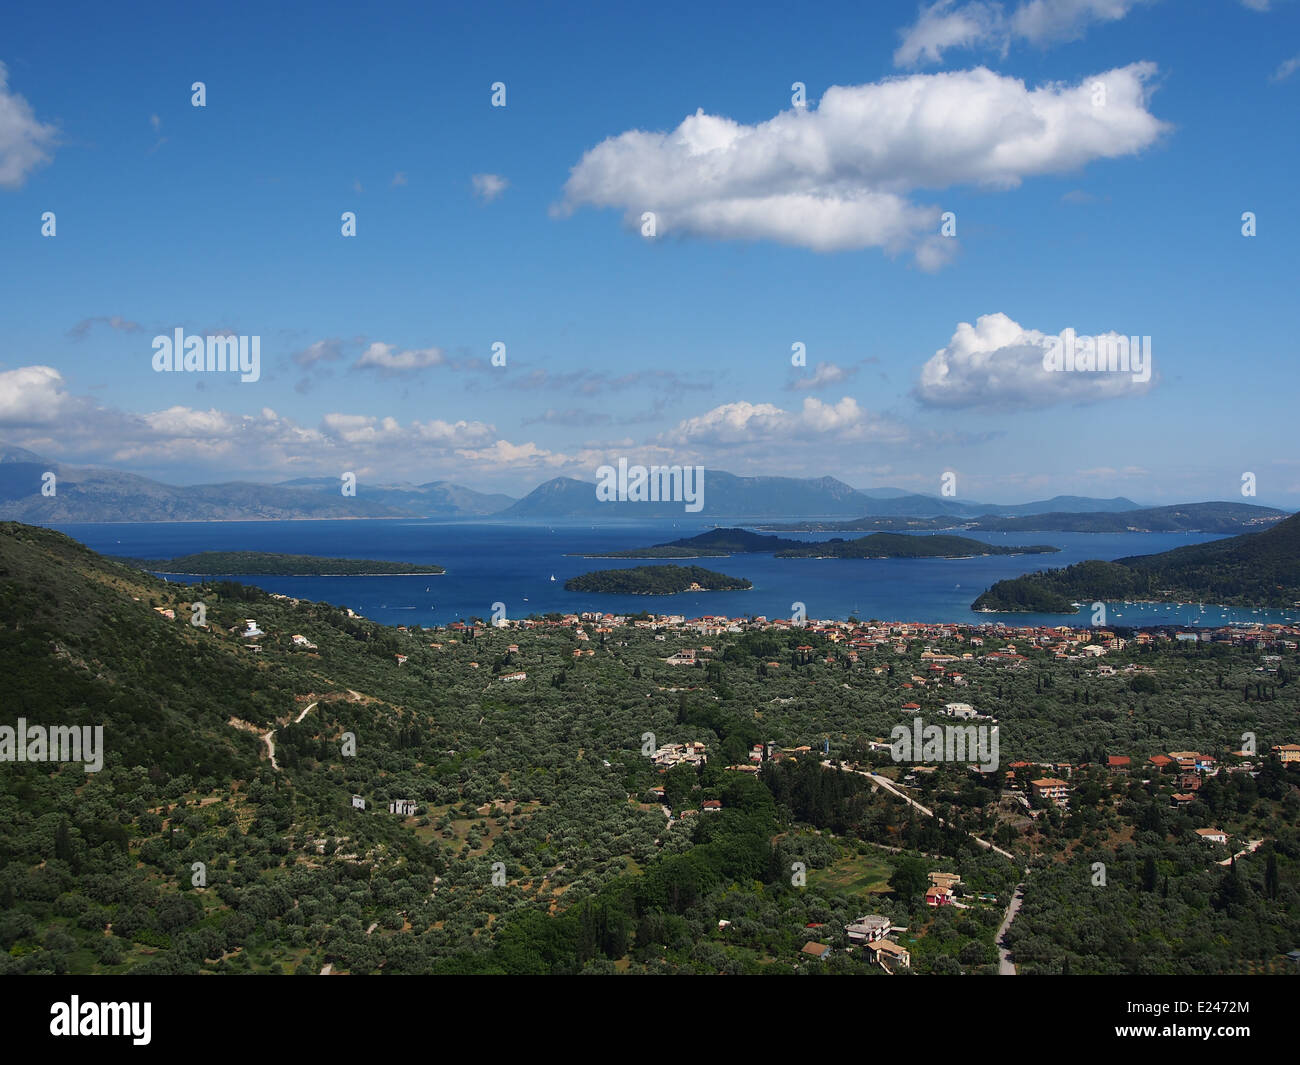 Ionian sea islands, pic7 - Stock Image